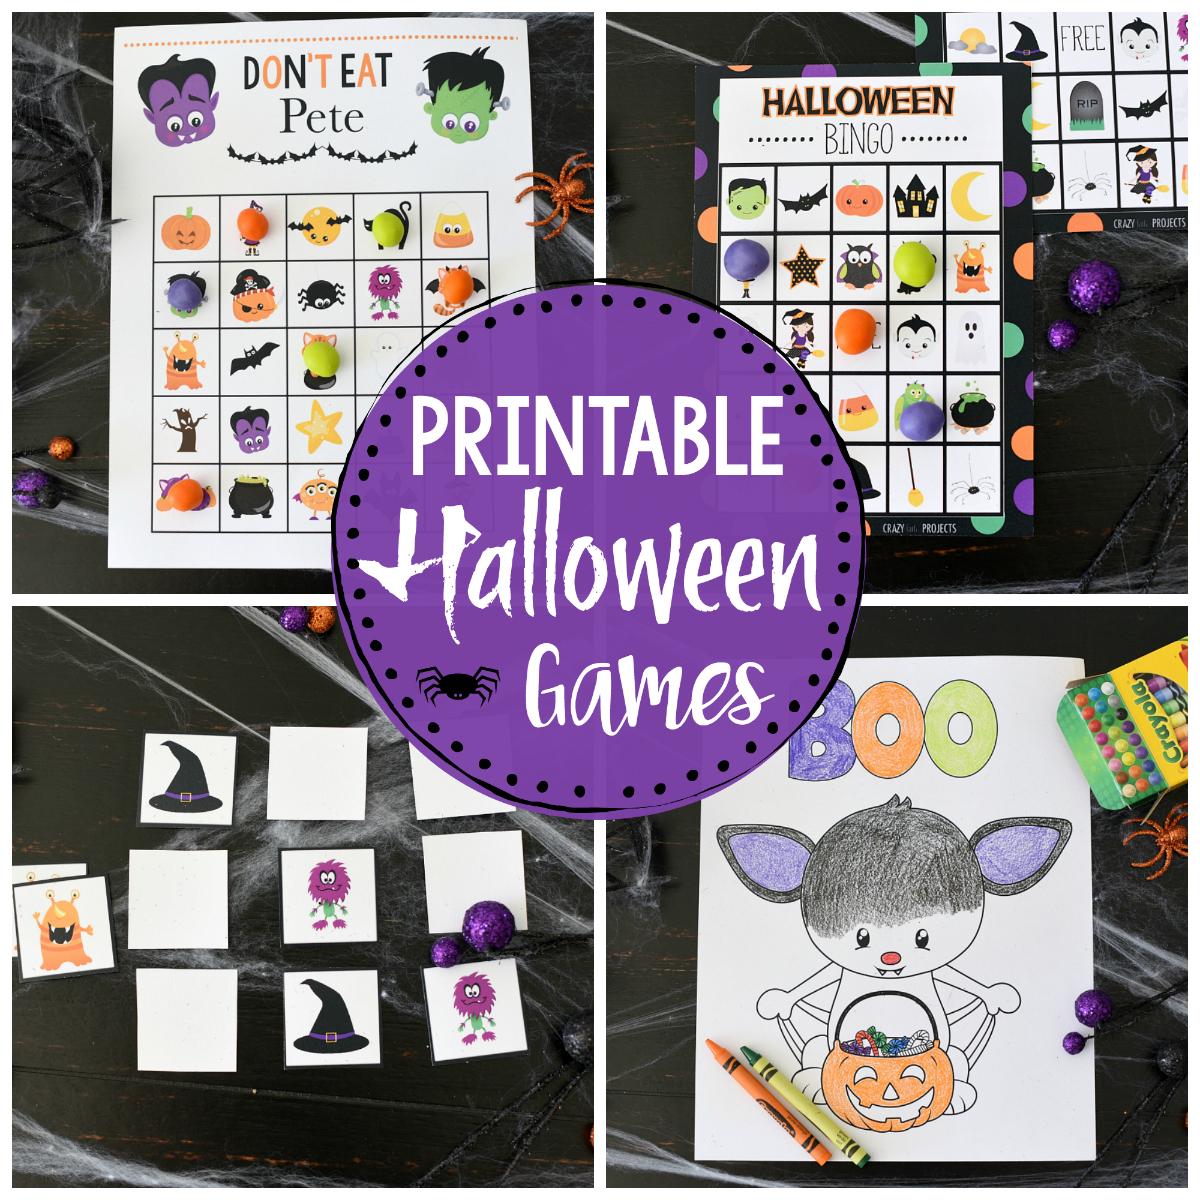 Cute Printable Halloween Games For Kids – Fun-Squared - Free Printable Halloween Games For Kids